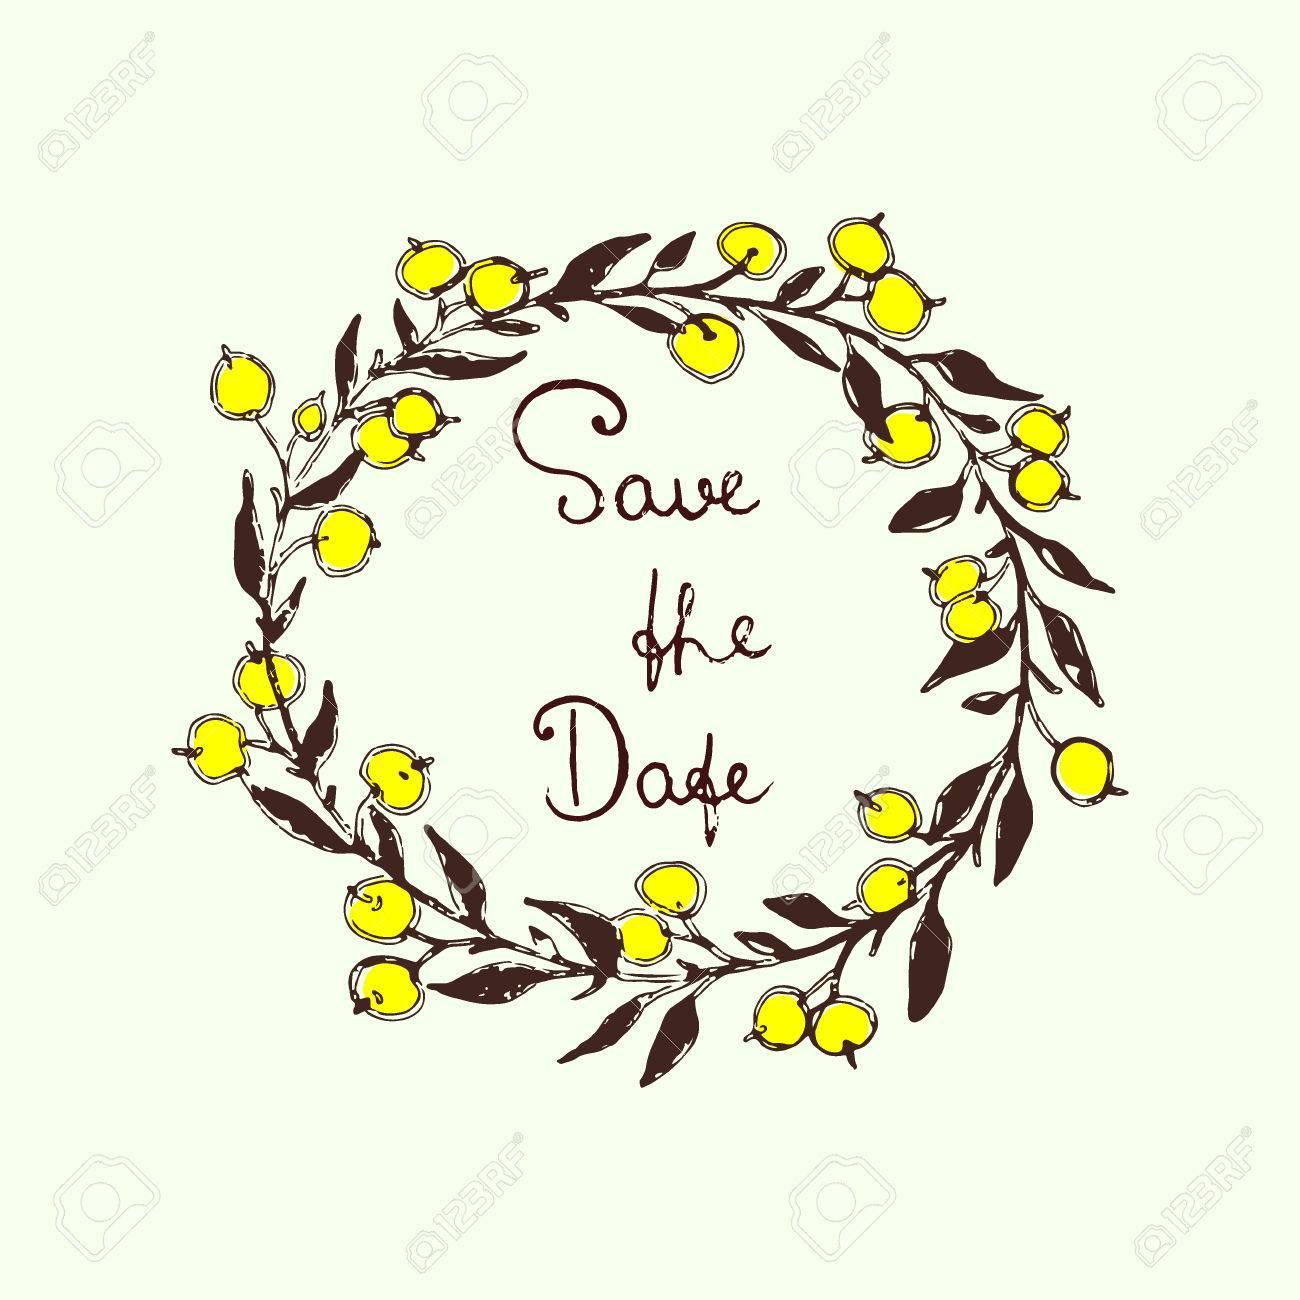 Vector Wedding Invitation Card. Hand Drawn Floral Wreath With ...